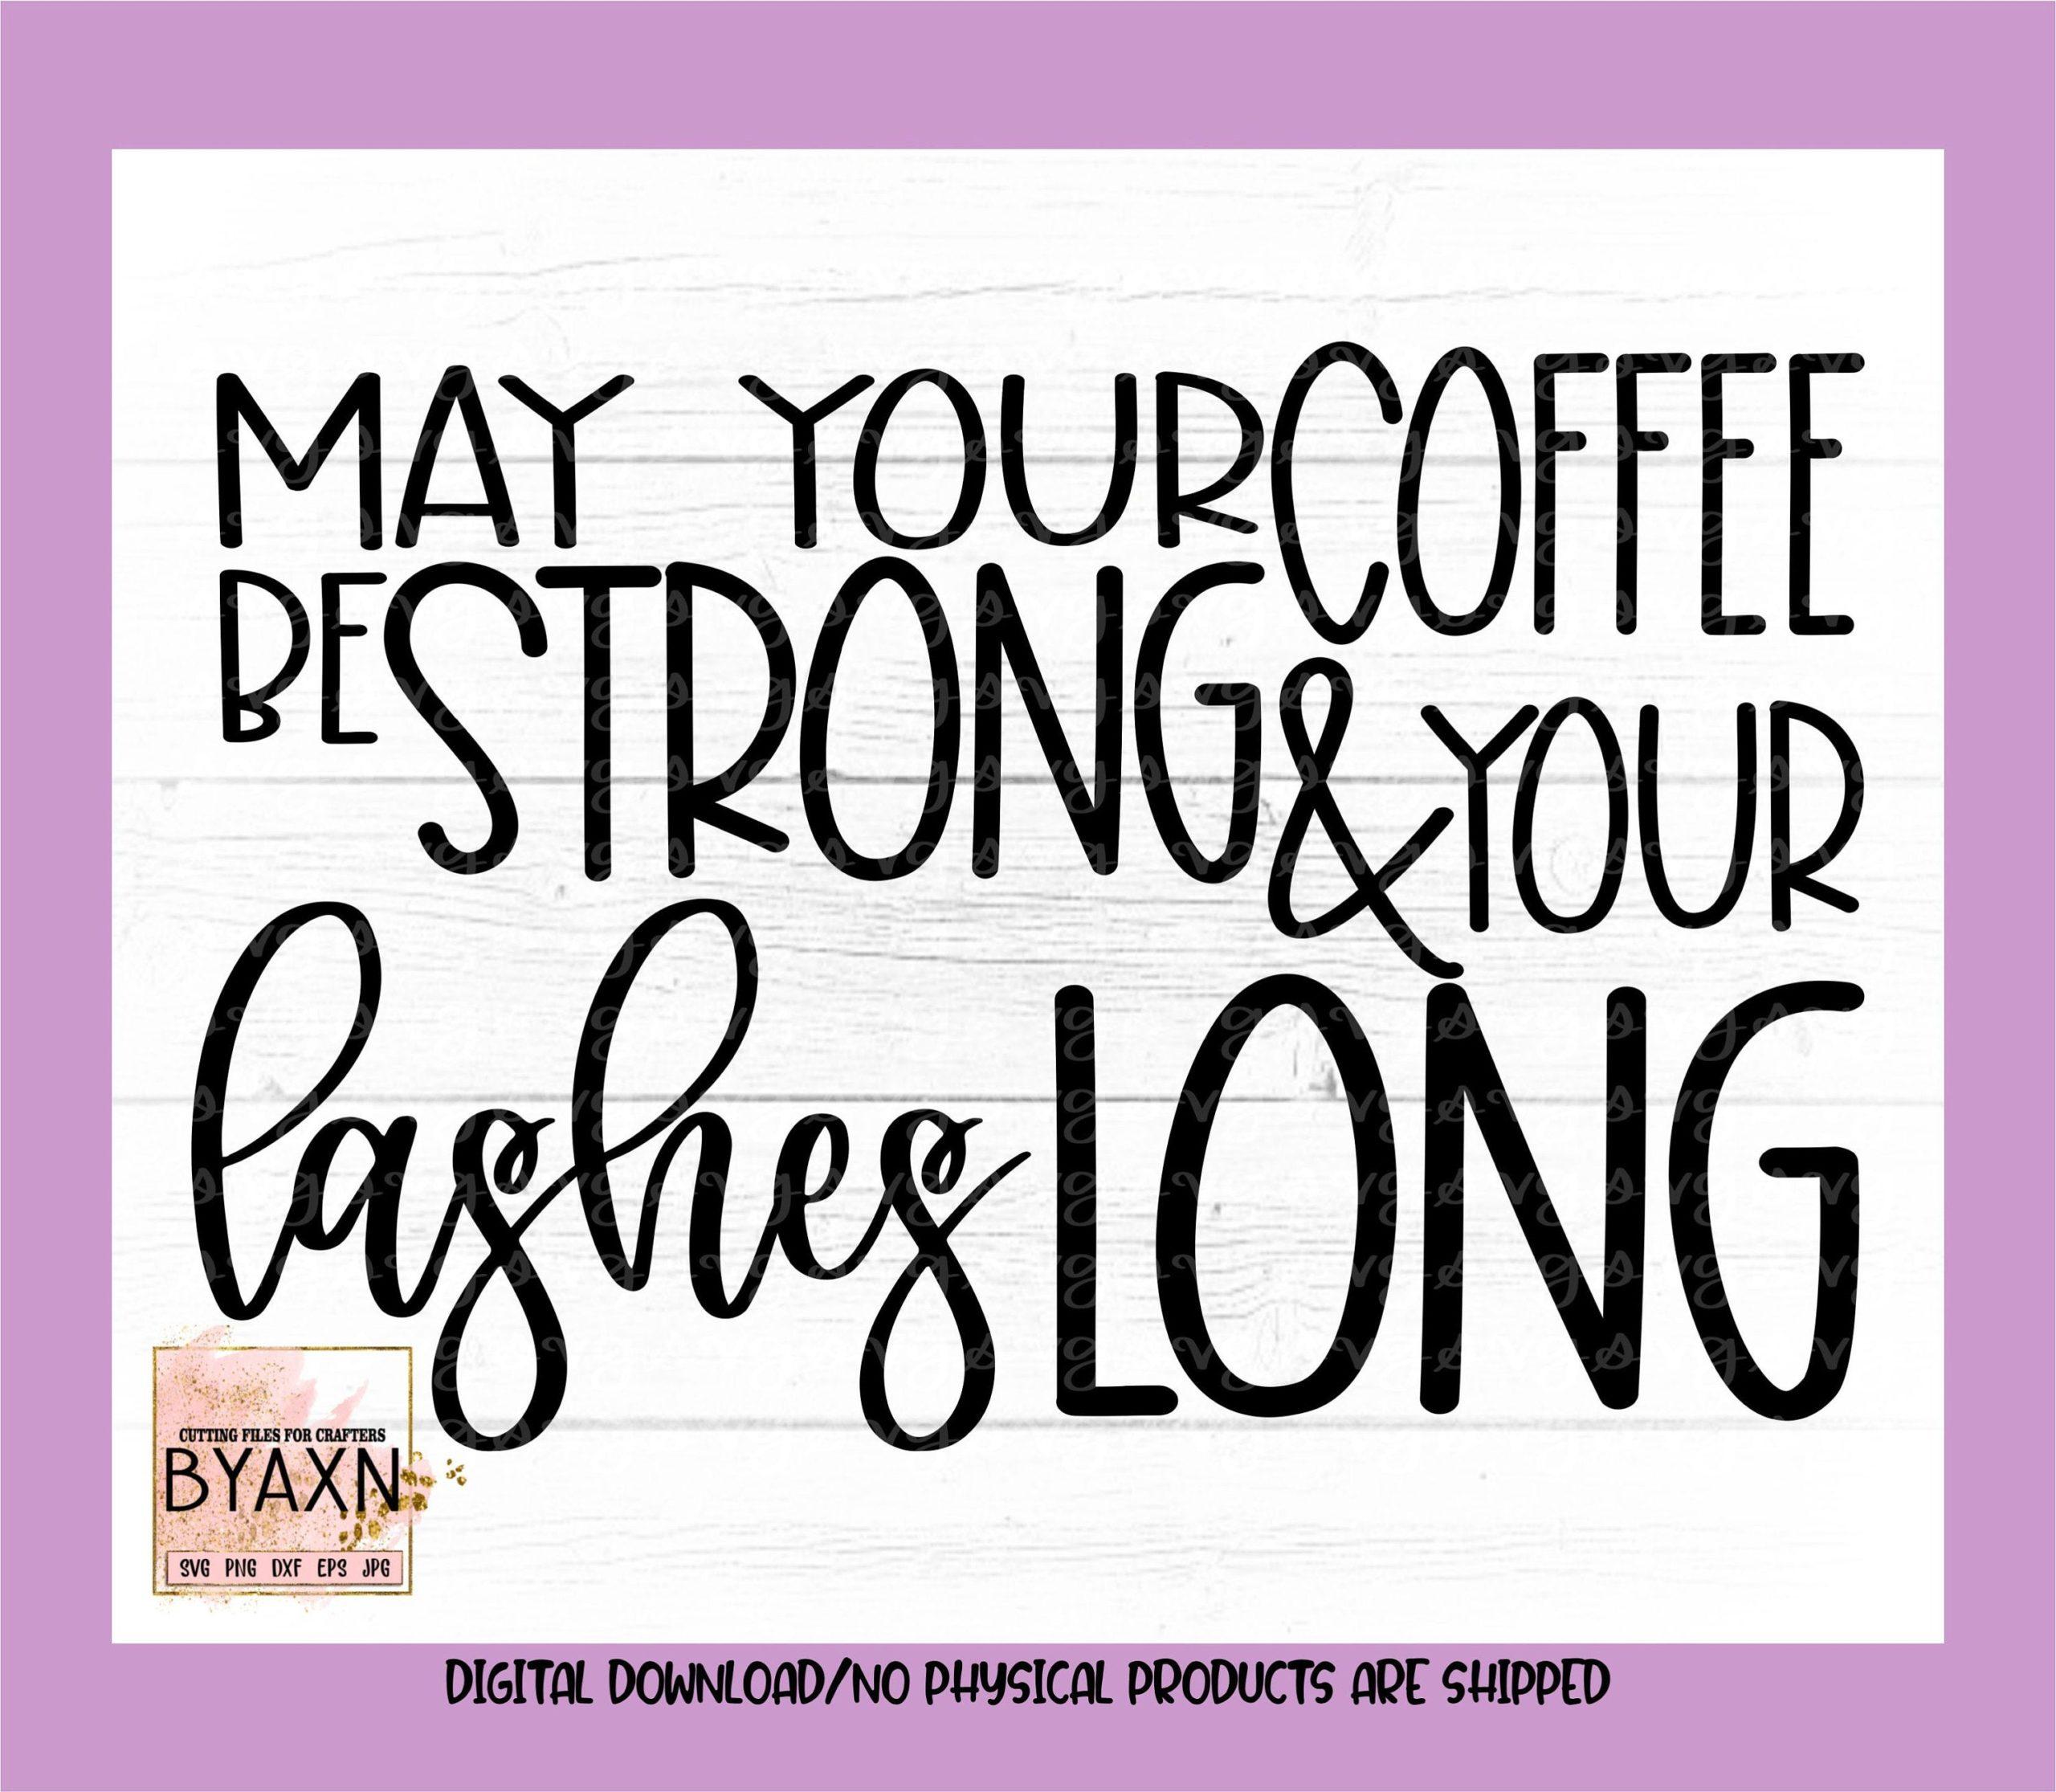 Make-up-svgmay-your-coffee-be-strong-and-lashes-long-svg-makeup-lover-svg-mascara-svg-makeup-svg-design-makeup-cut-file-cricut-svg-6051495e